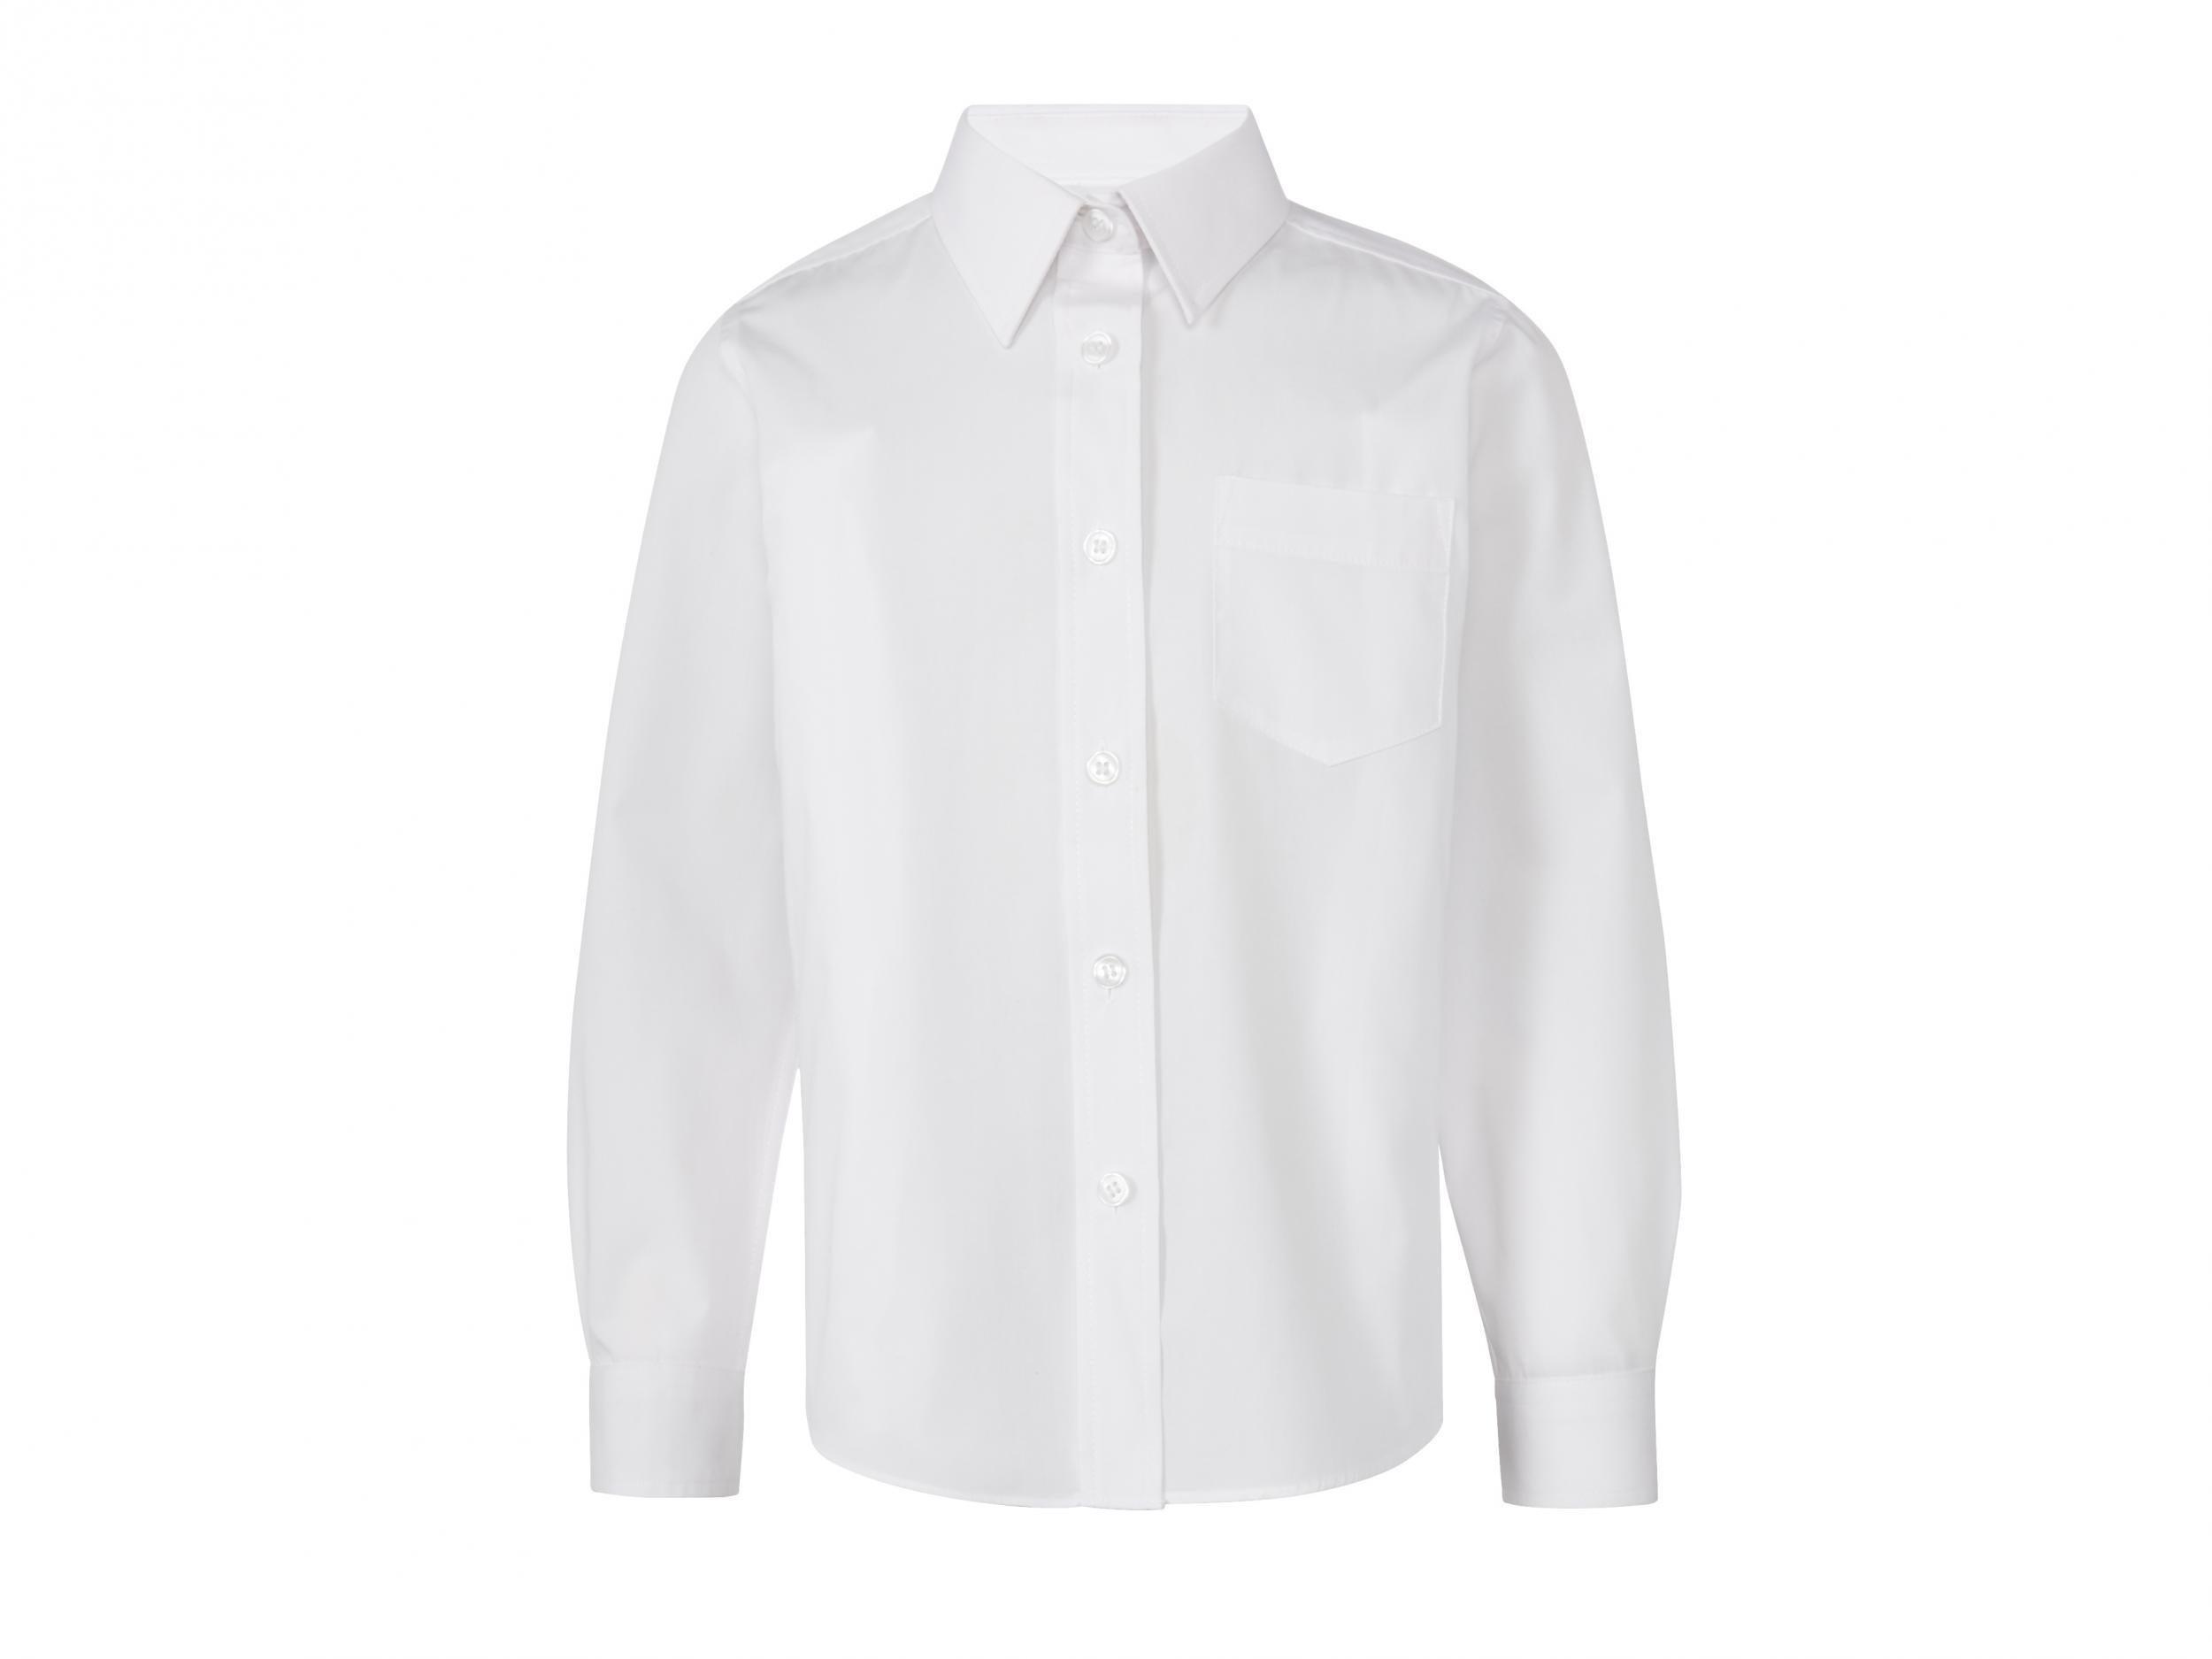 Short Sleeved Boys School Uniform Smart Shirt Shirt